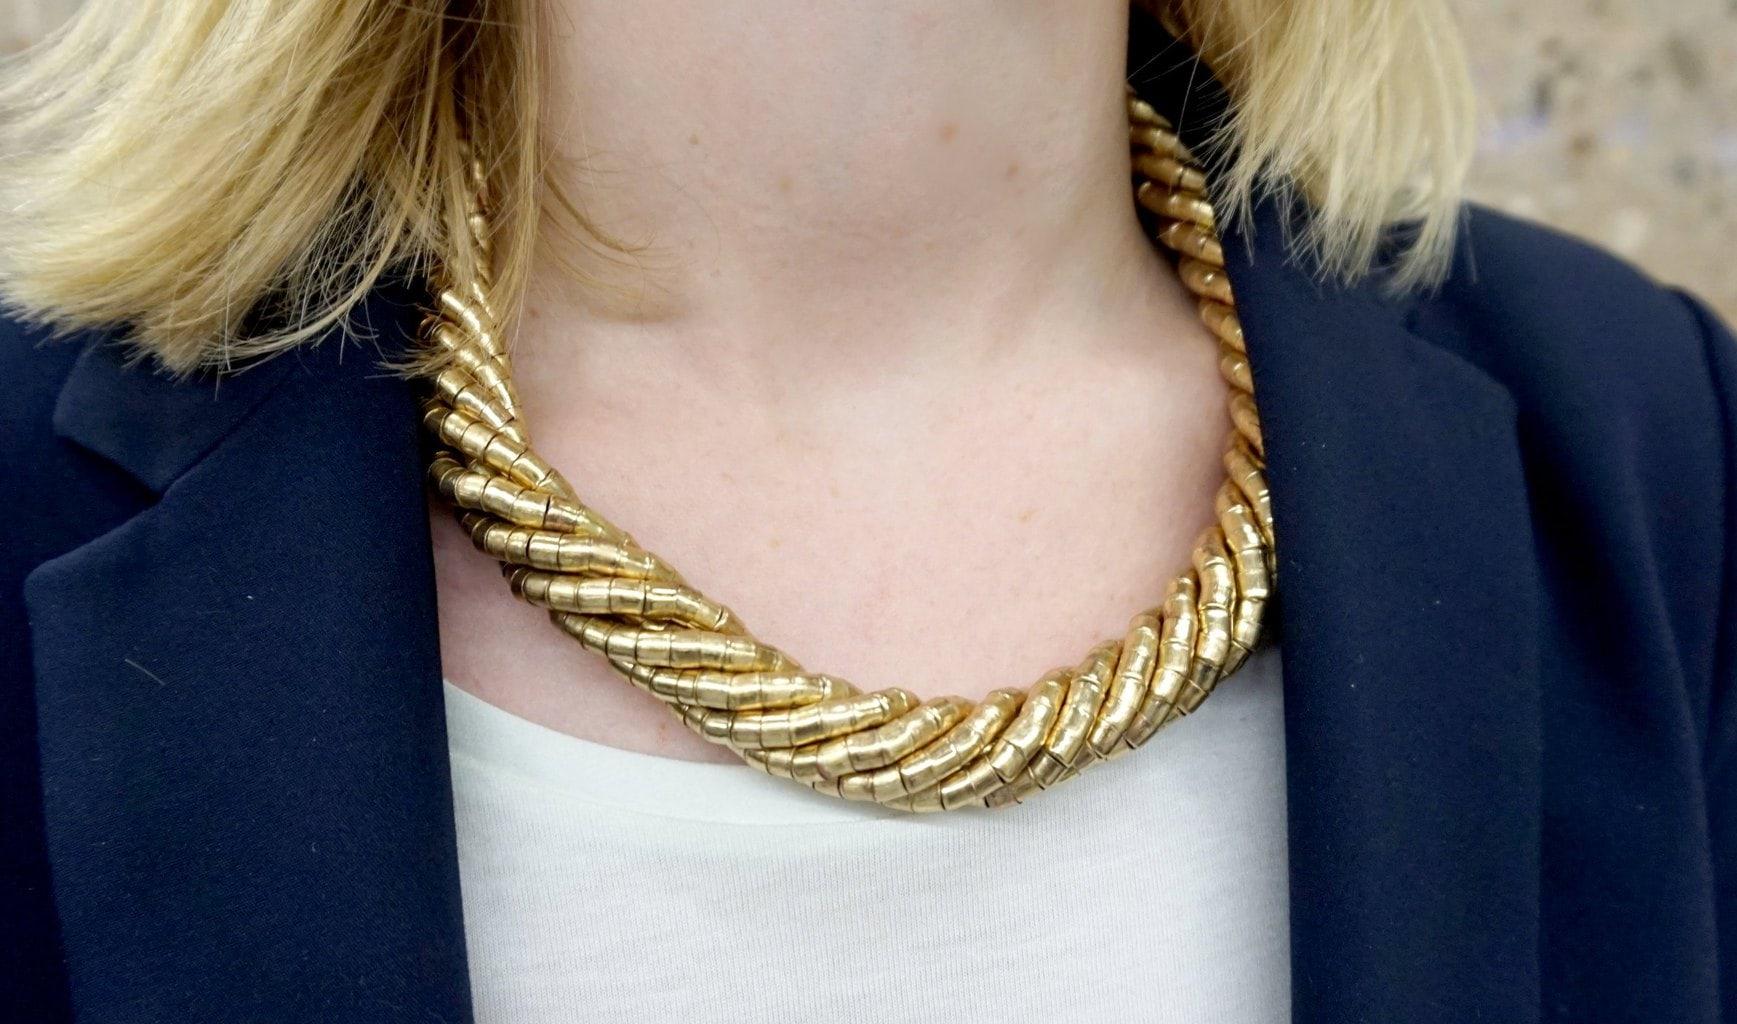 LOC-UV-Elena-Necklace